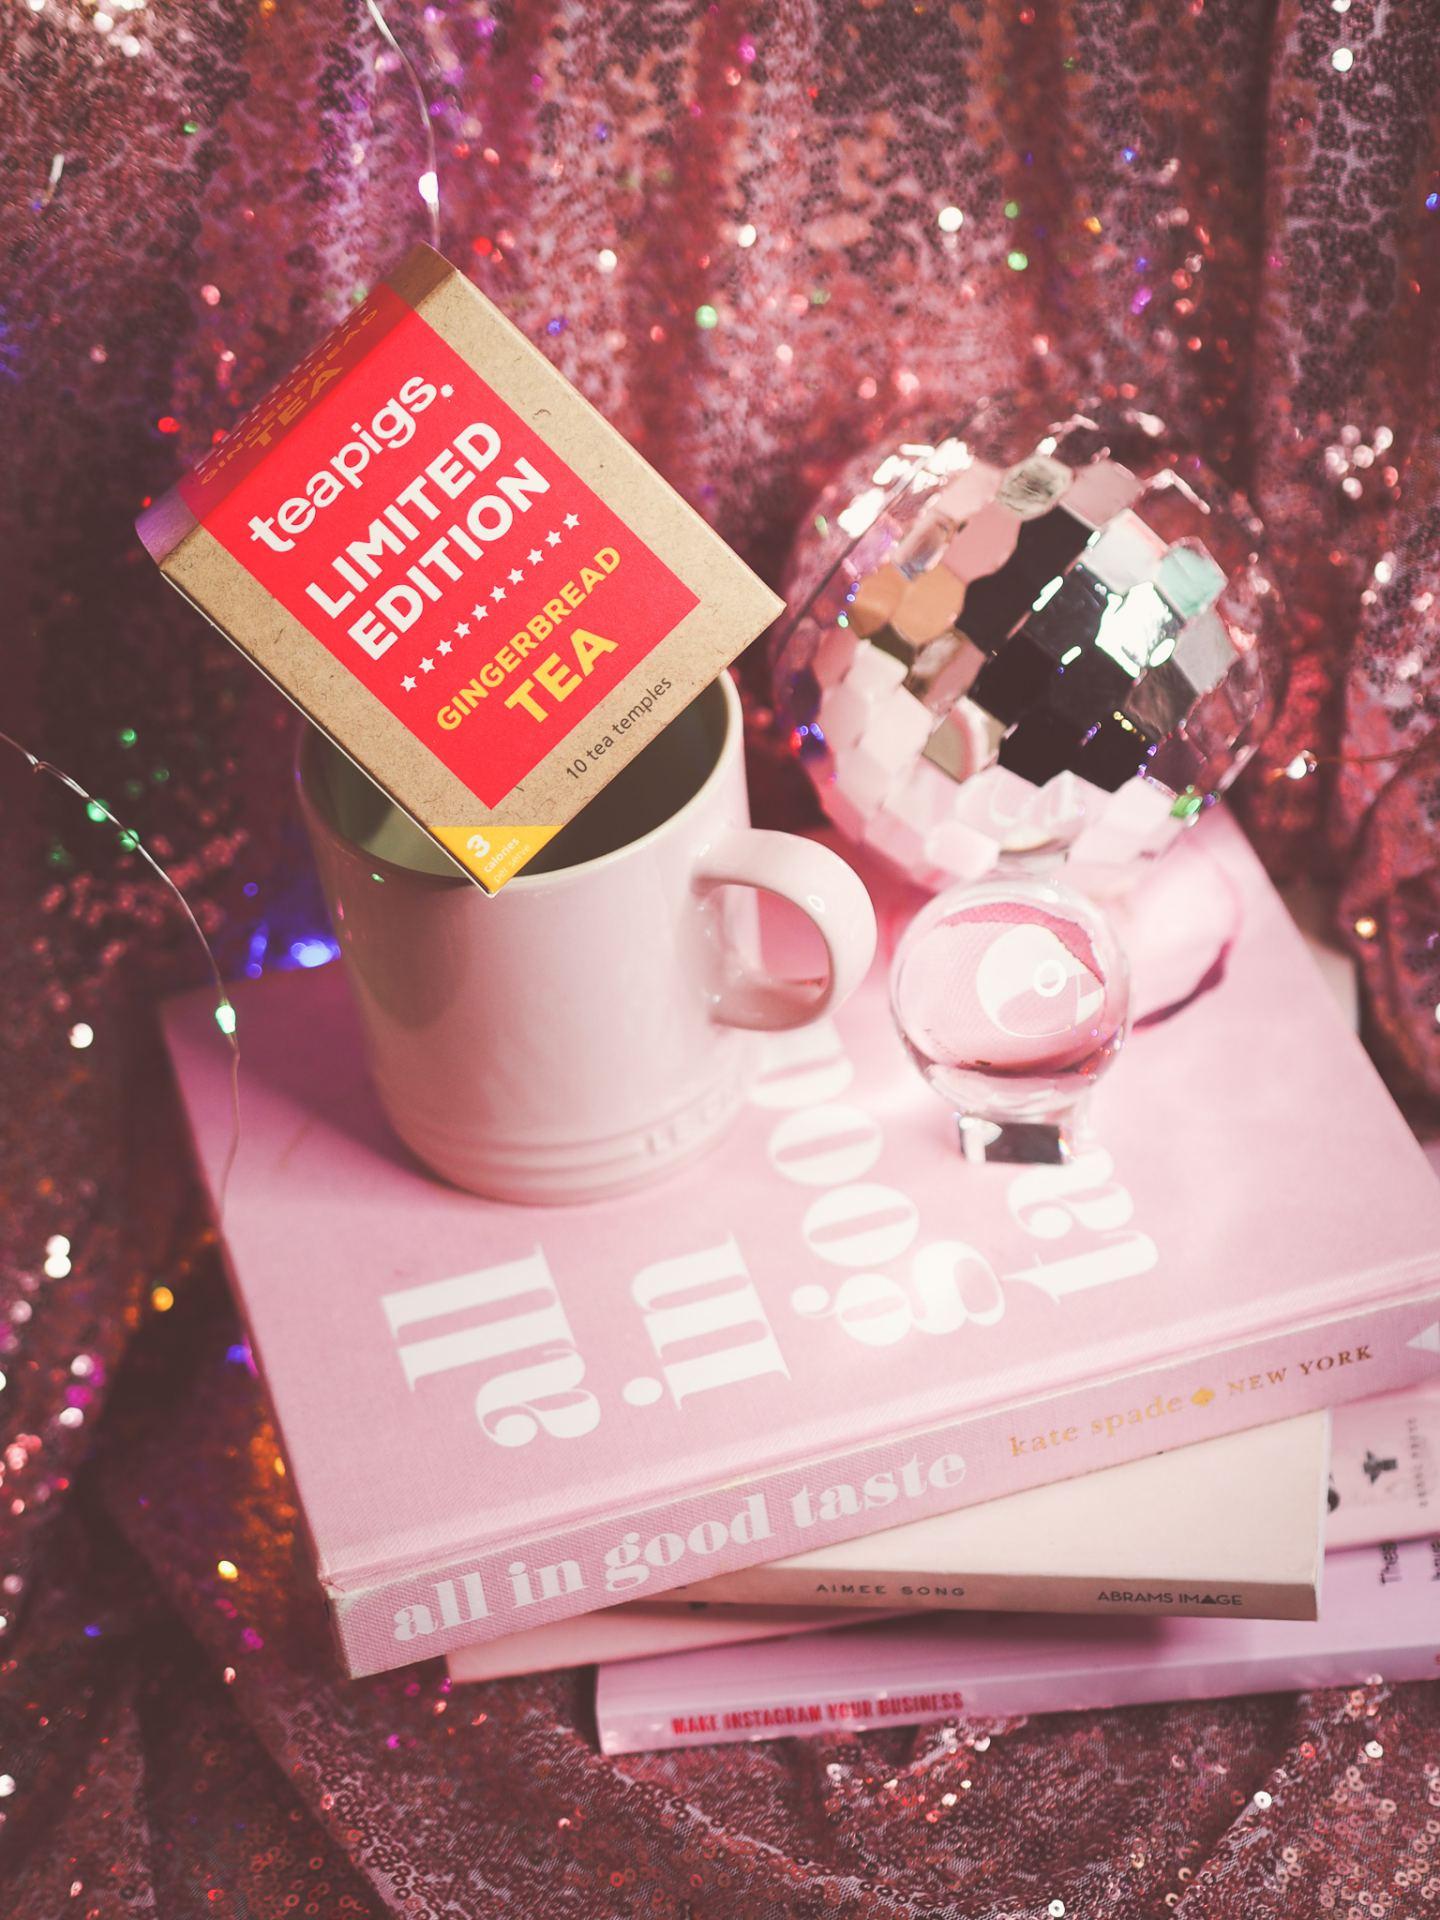 Le Creuset Mug & Teapigs Tea review pink all in good taste Kate spade book